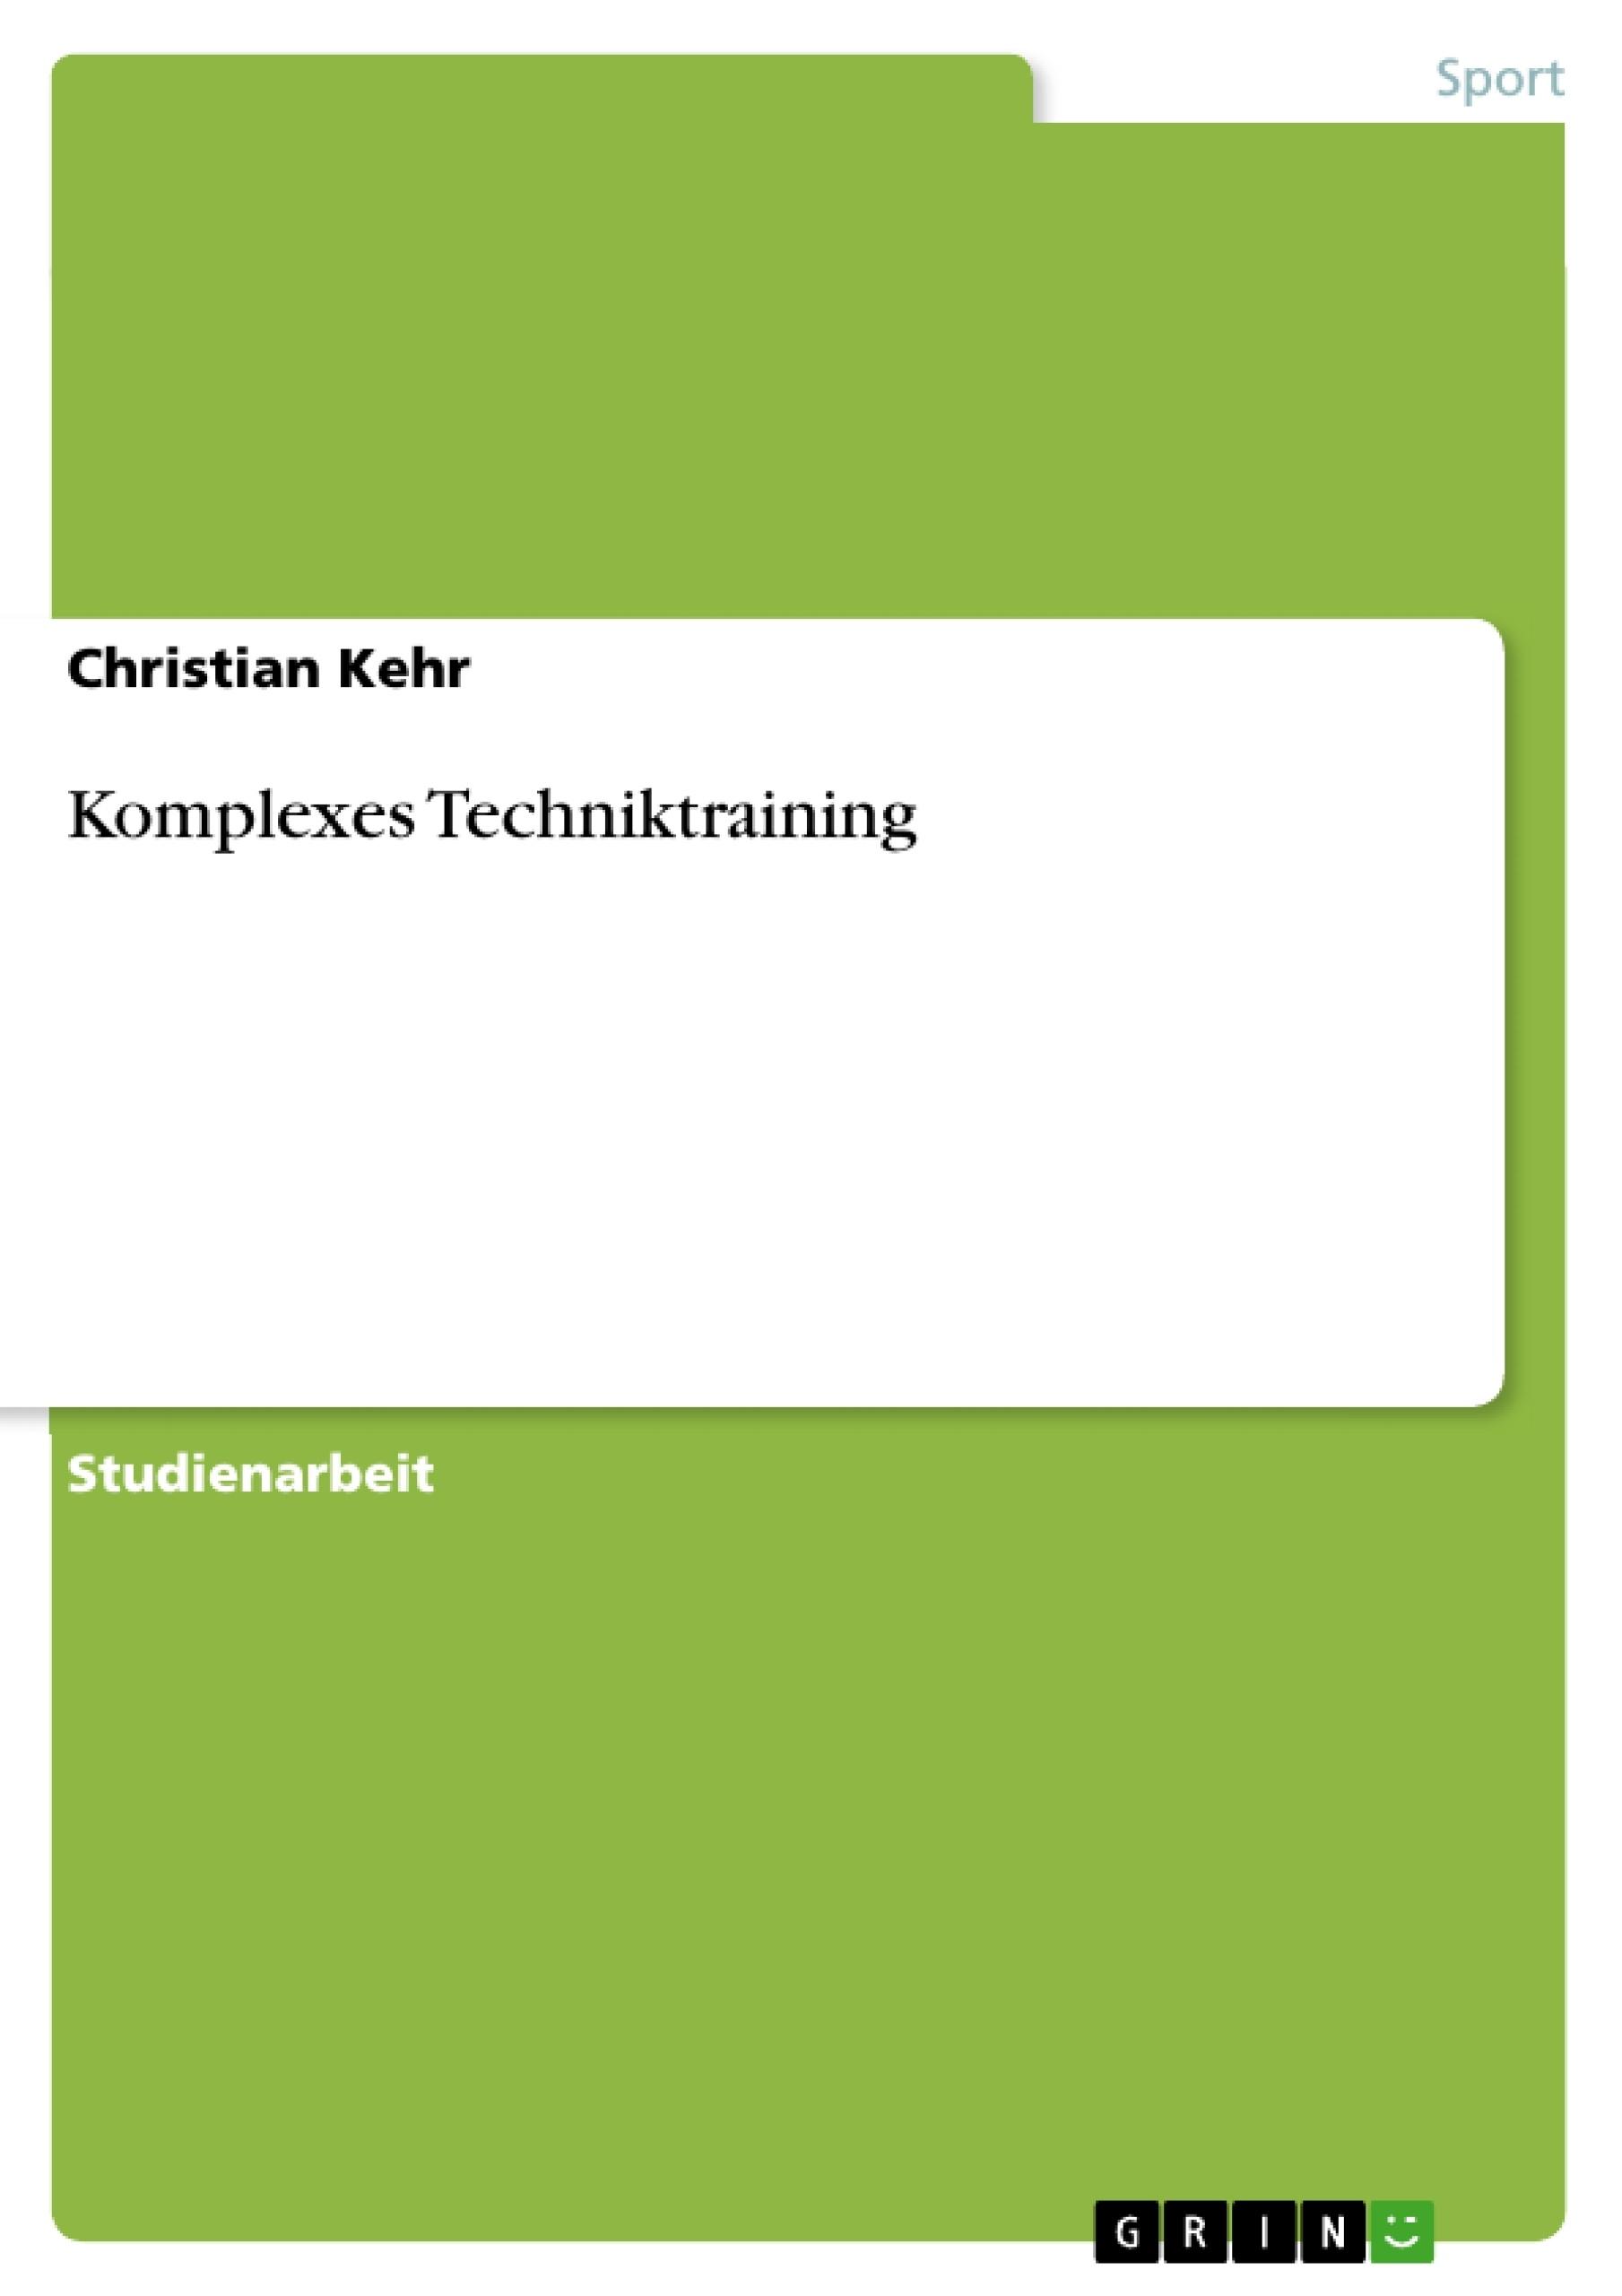 Titel: Komplexes Techniktraining